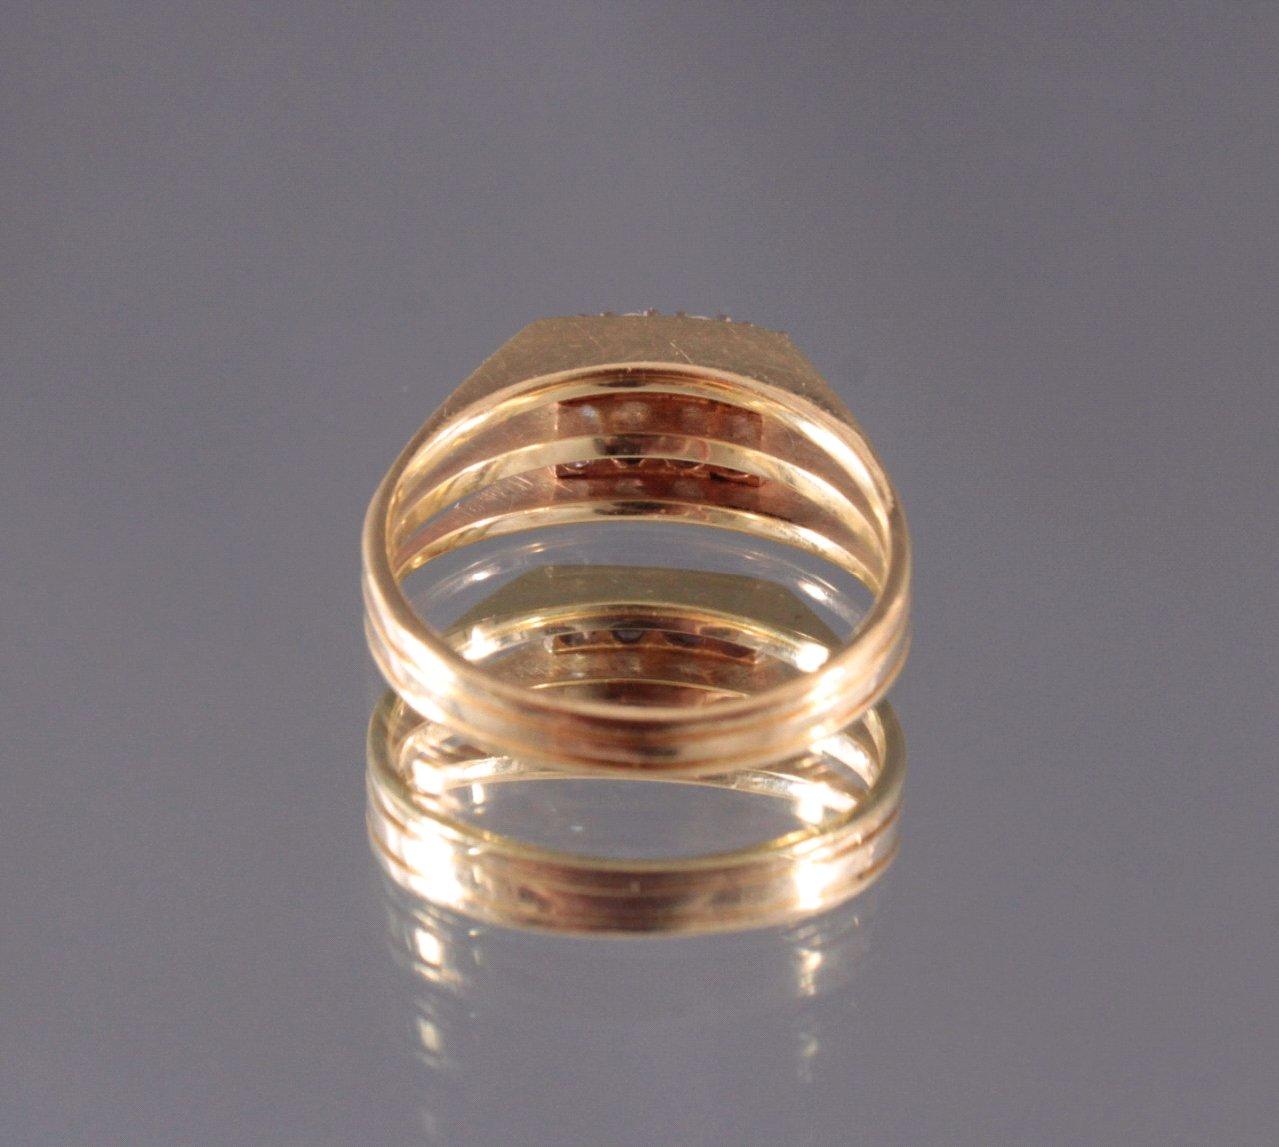 Damenring mit 6 Diamanten, 585/000 Gelb Gold-2